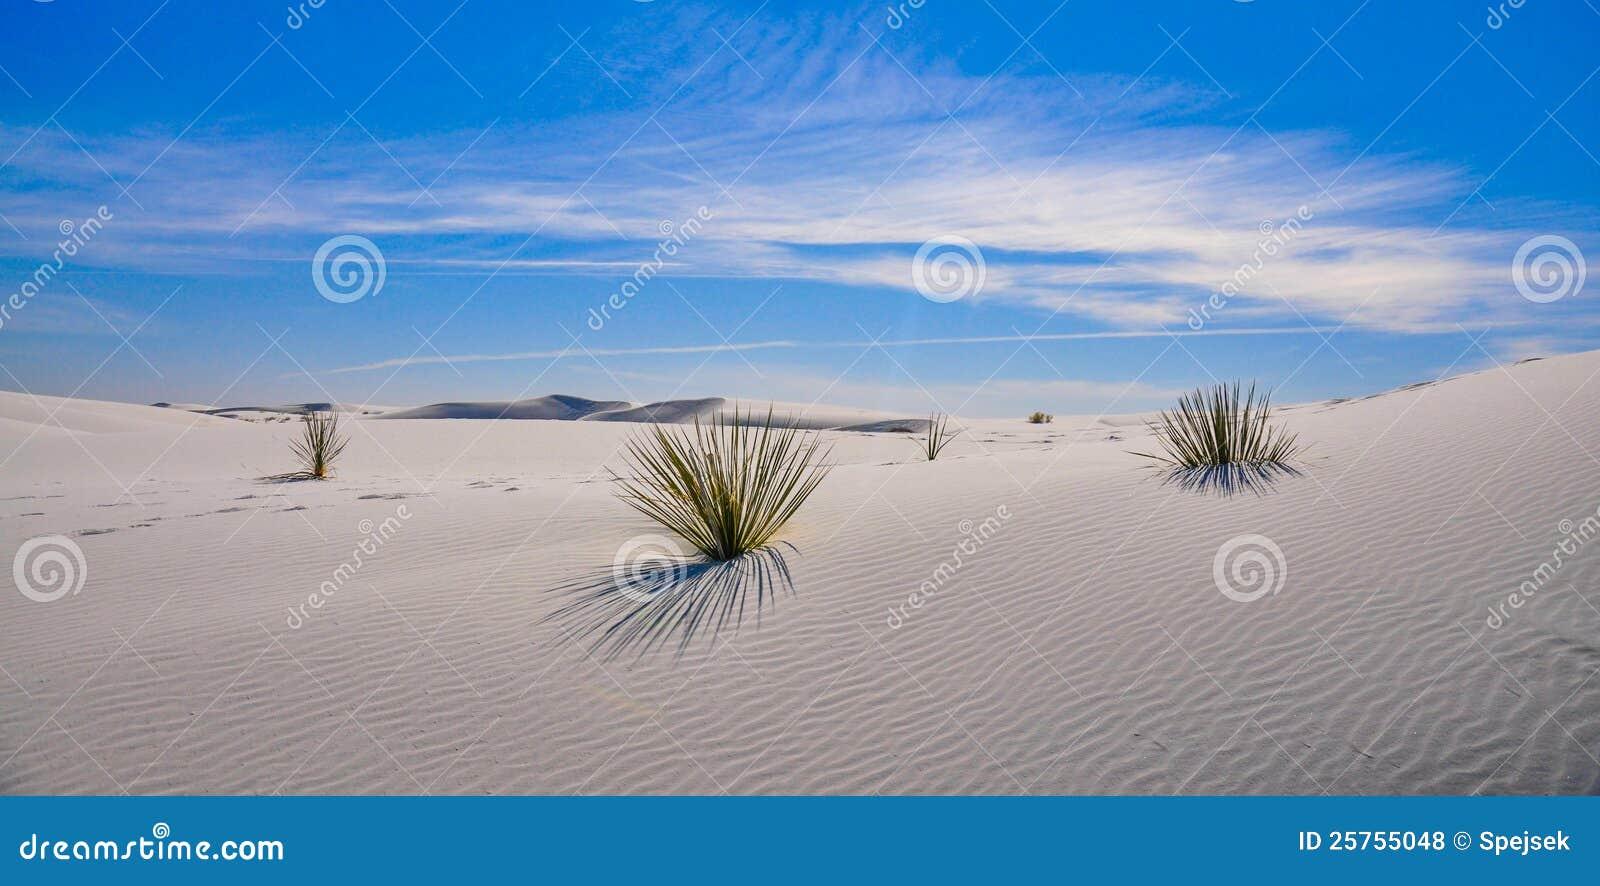 White sands national monument with desert dunes